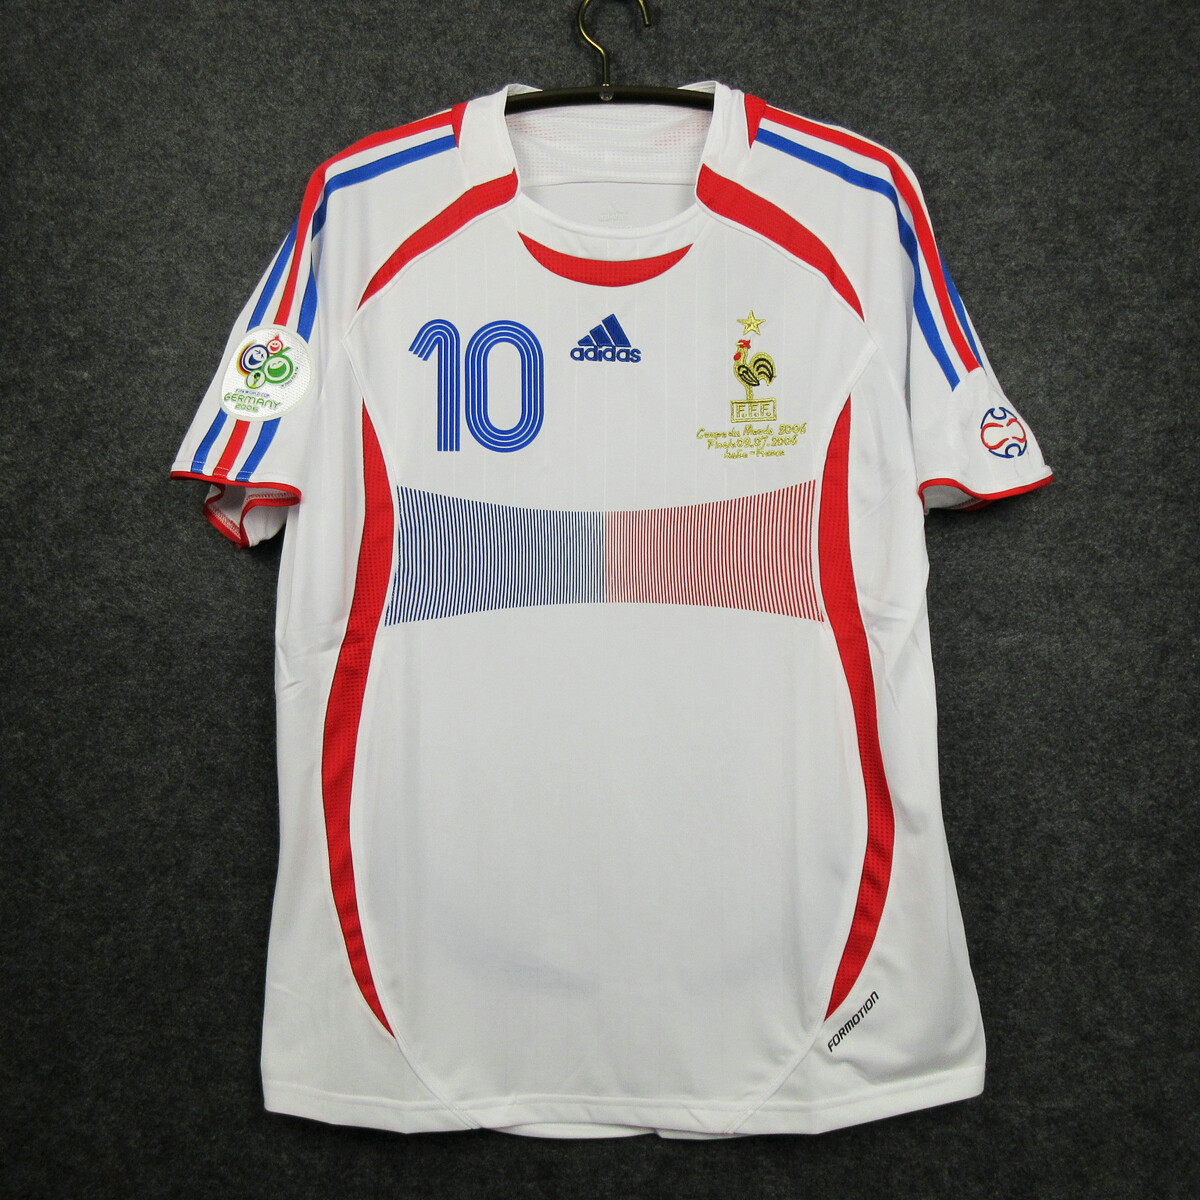 Camisa França 2006